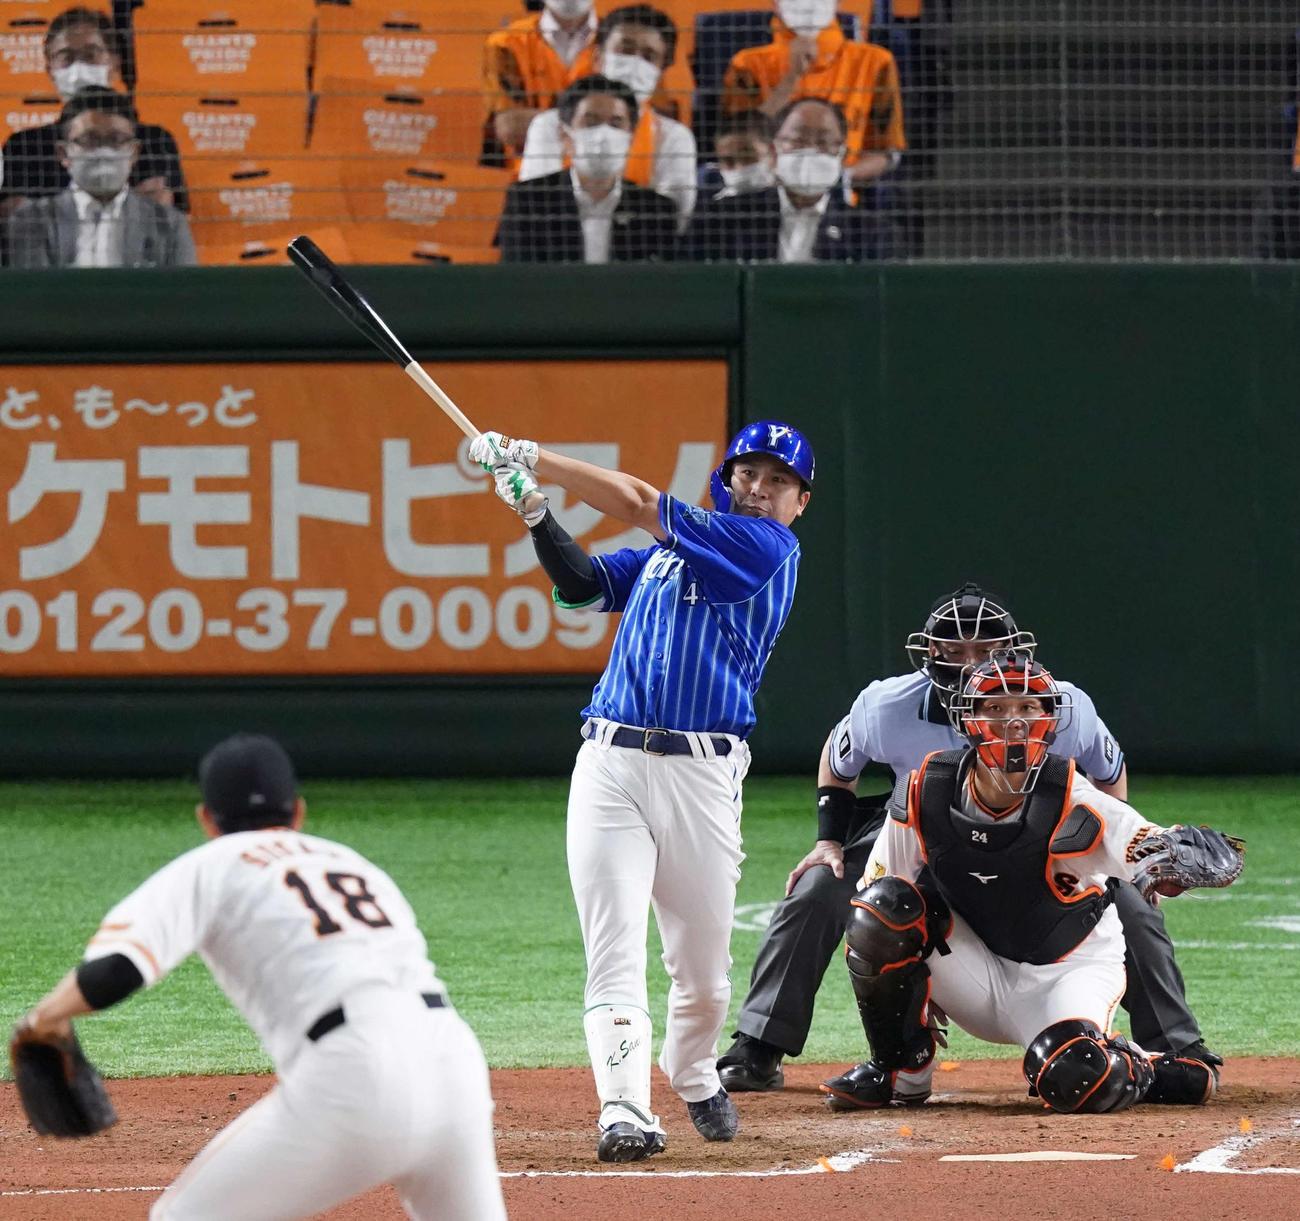 巨人対DeNA 6回表DeNA無死、ソロ本塁打を放つ佐野。投手菅野(撮影・江口和貴)